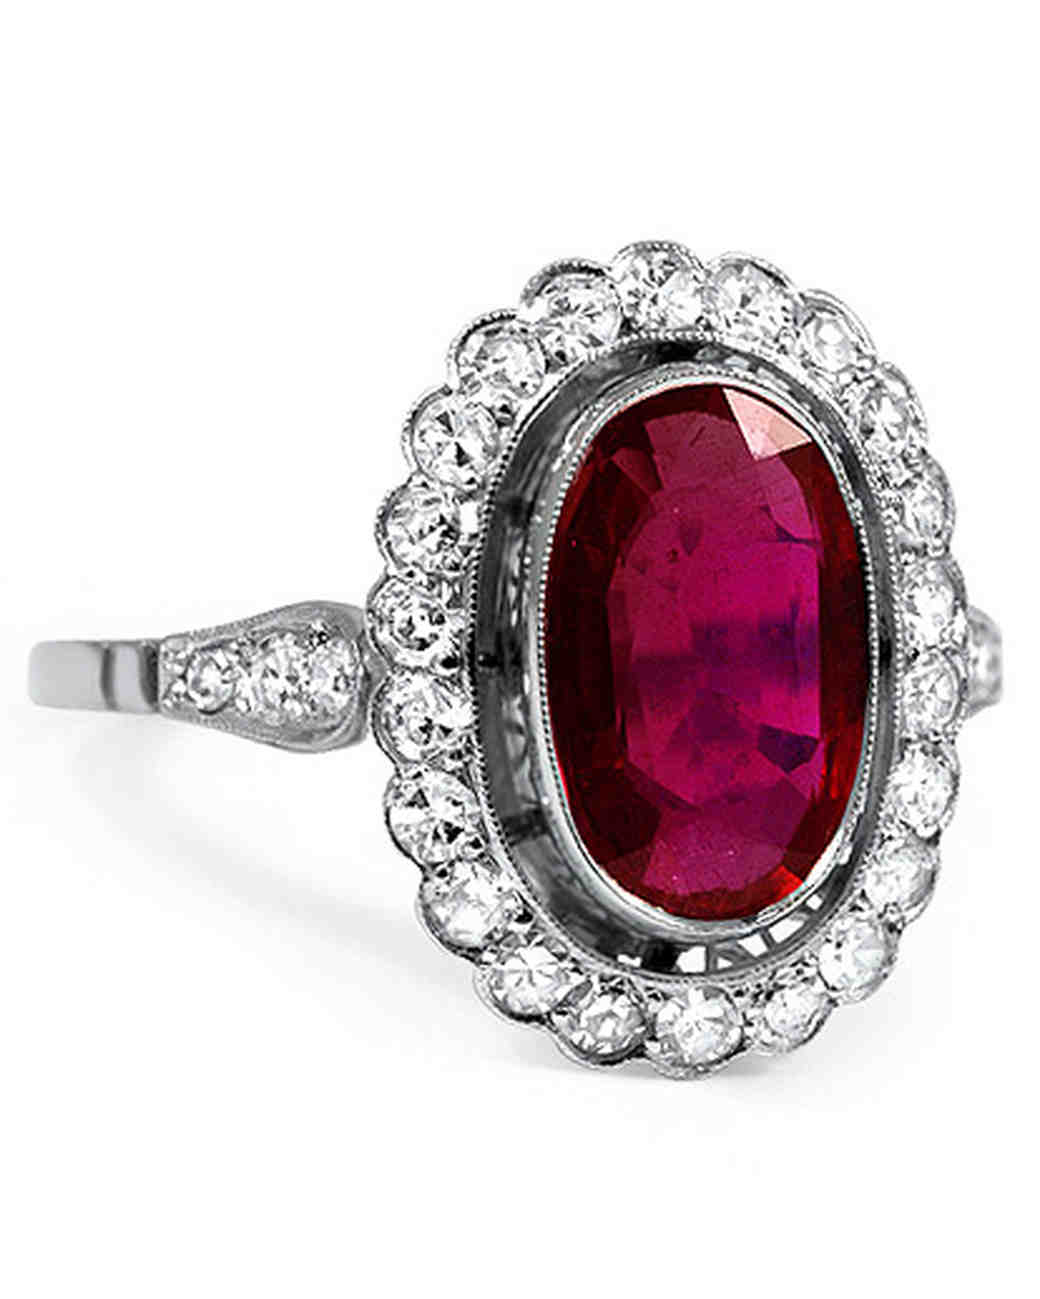 Black Gold Wedding Rings 006 - Black Gold Wedding Rings